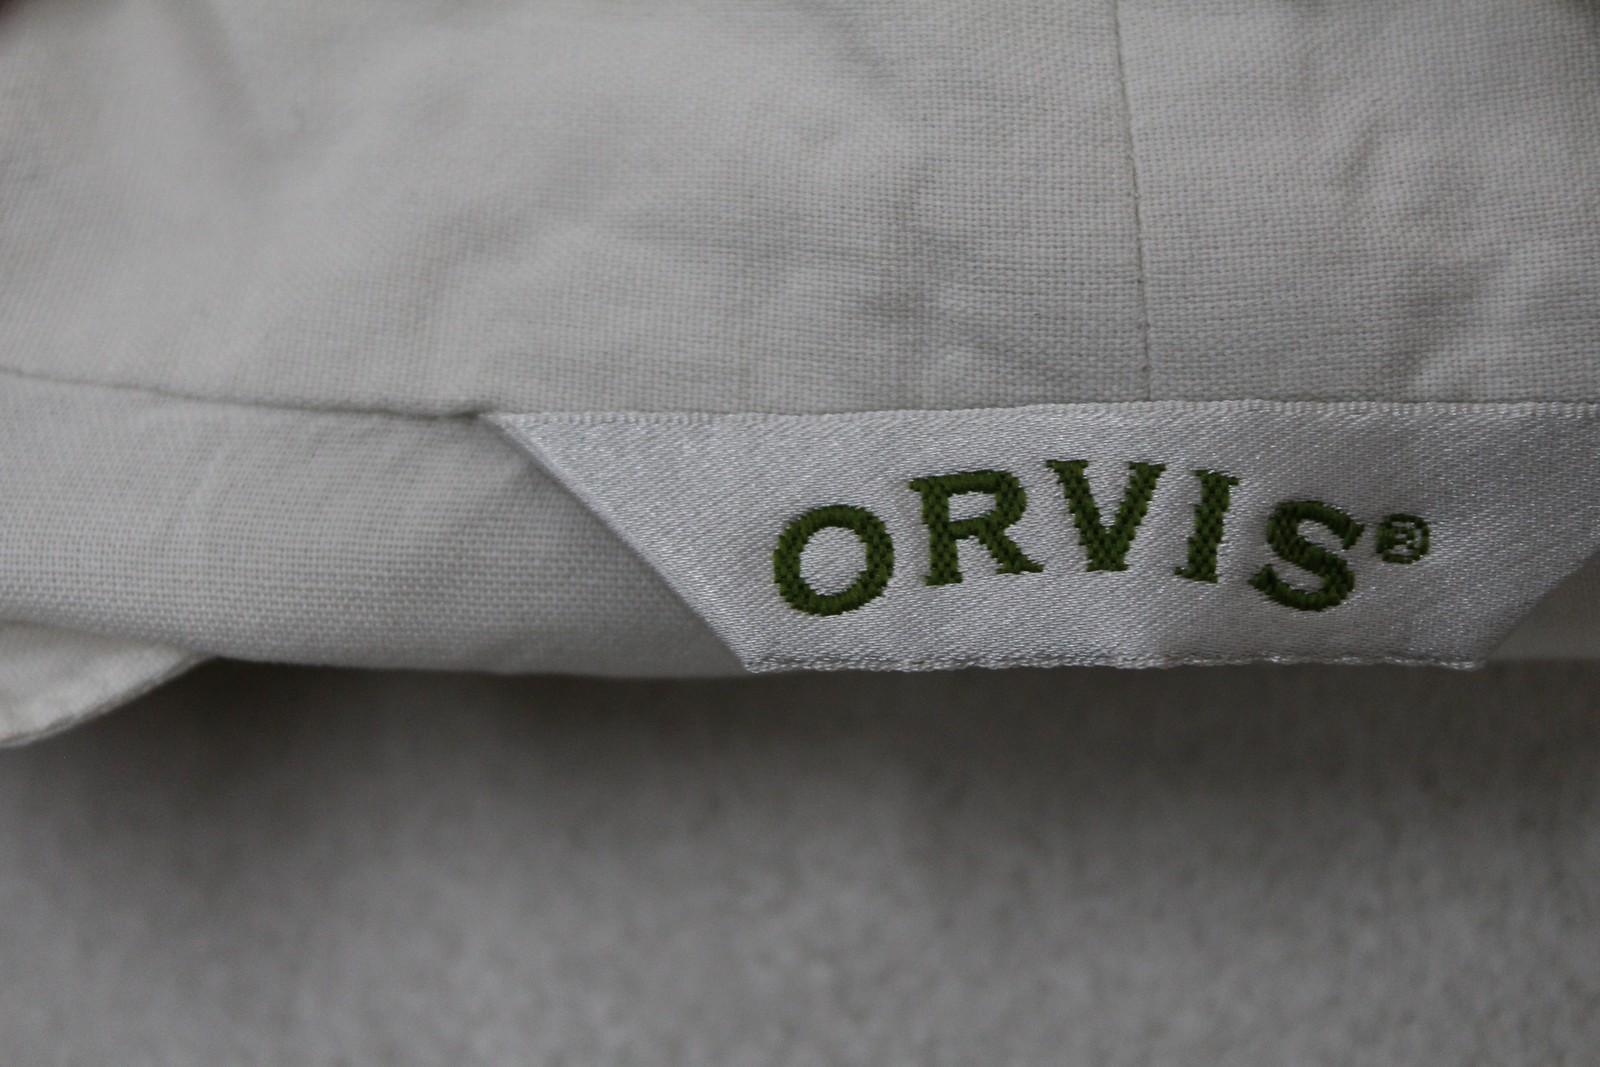 Orvis-Damas-Marfil-Seda-manga-larga-escote-en-forma-de-V-Blusa-Talla-S-UK6-8 miniatura 8